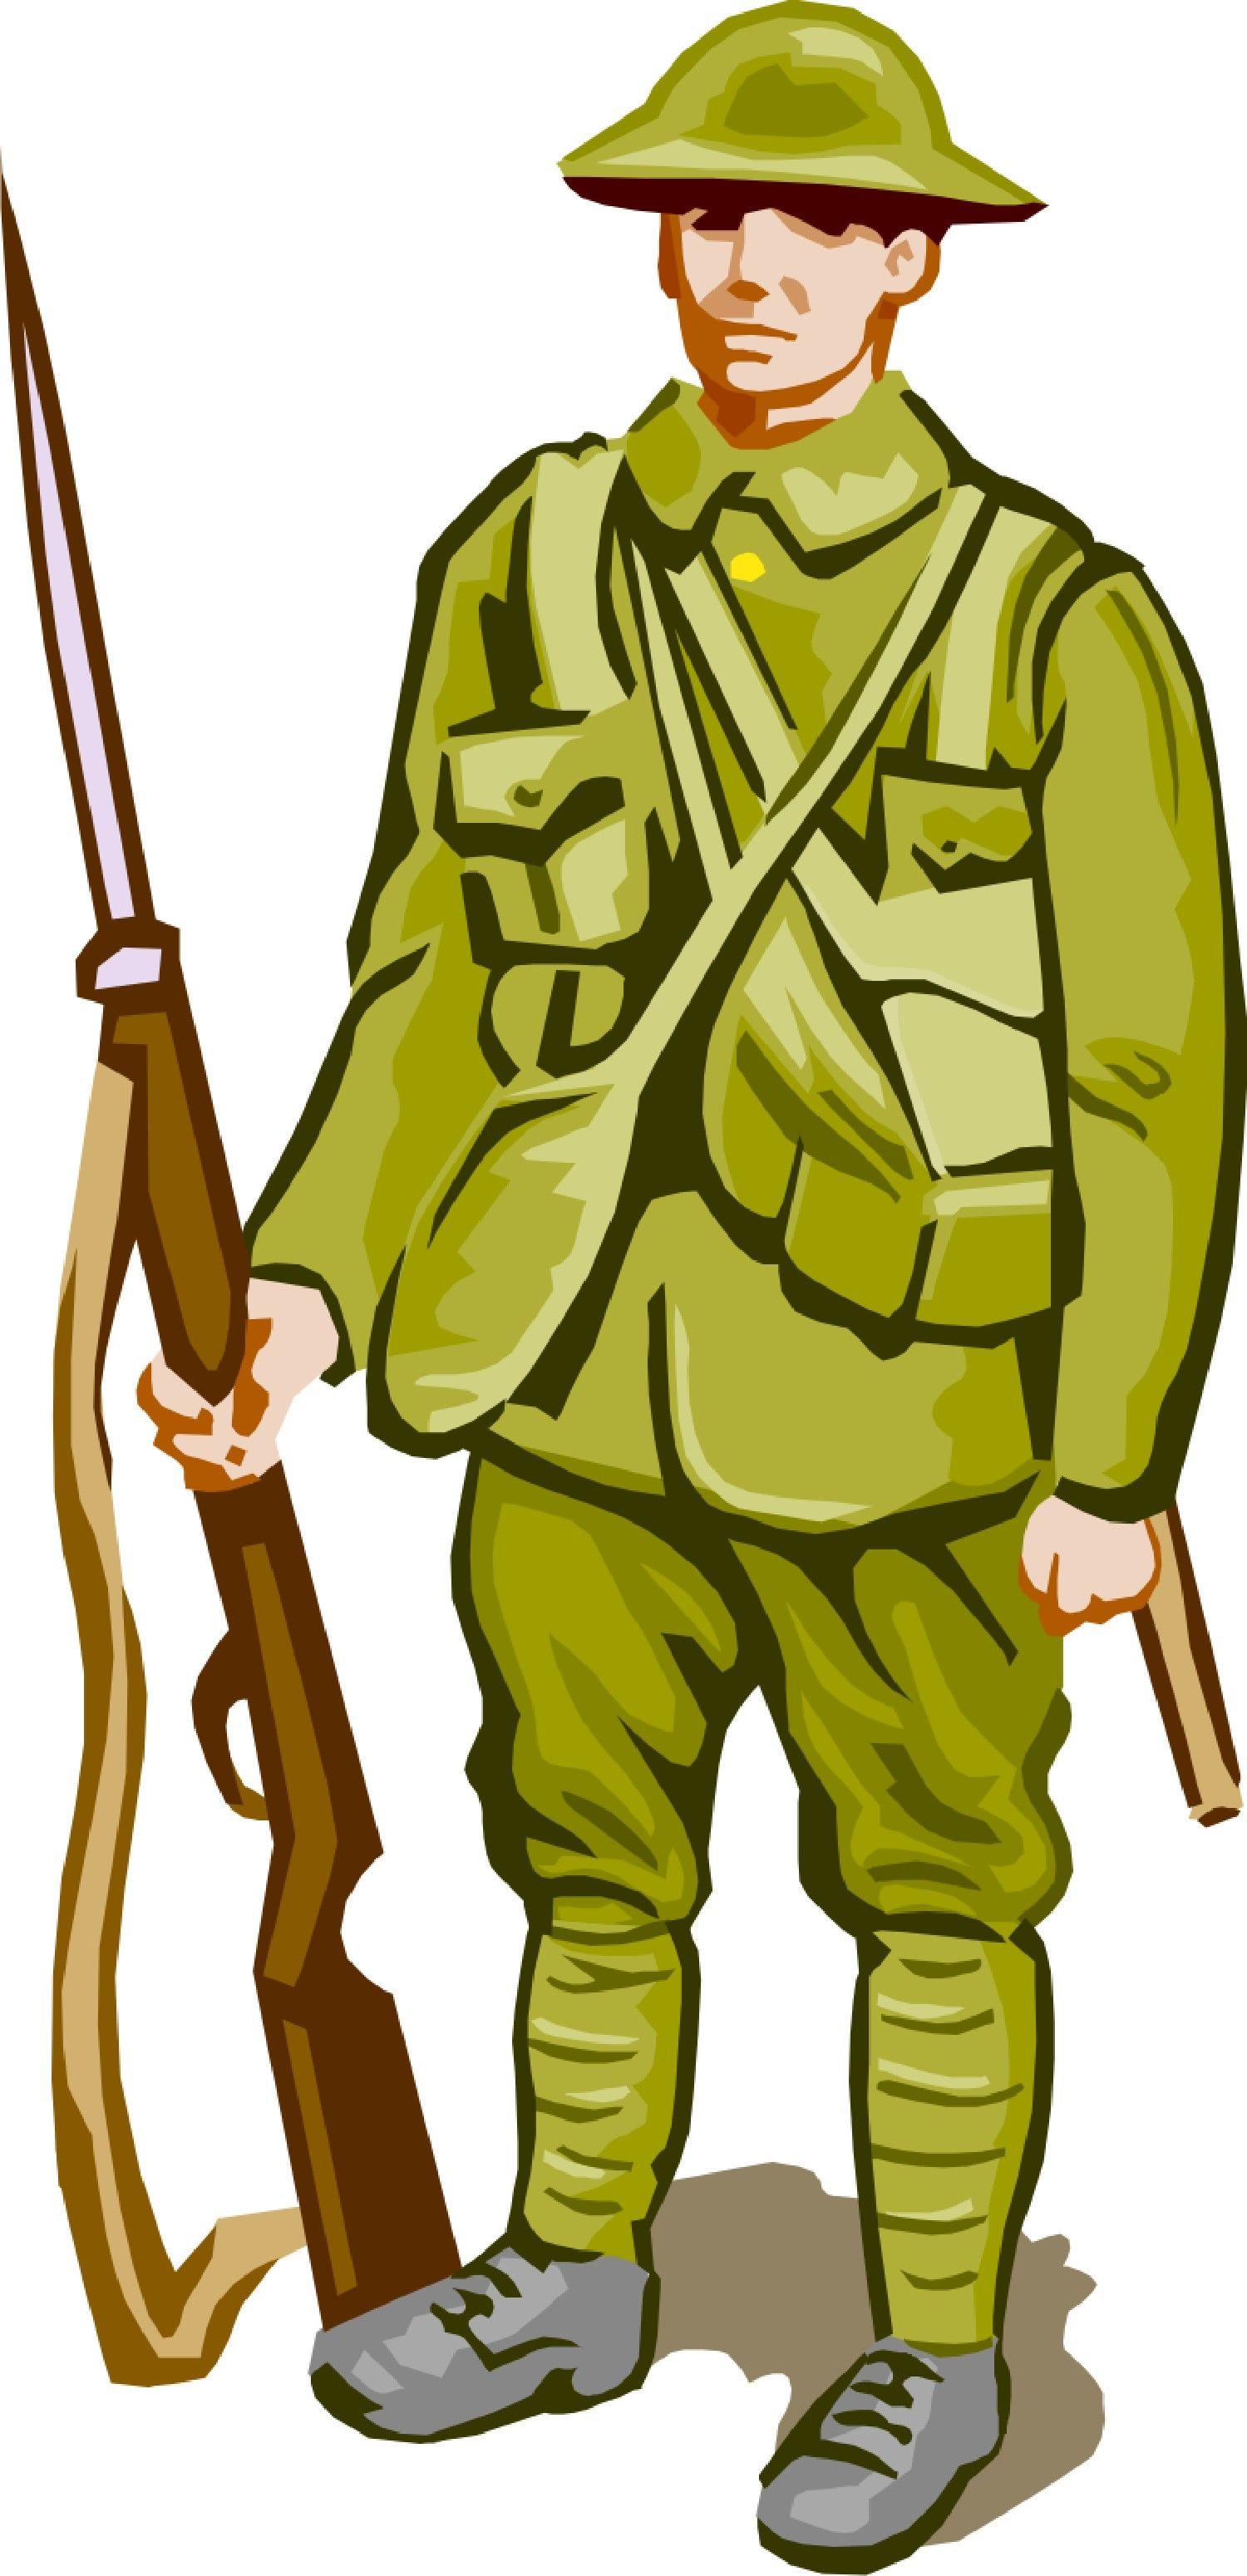 Ww1 british soldier clipart graphic library Rezultat iskanja slik za cartoon soldier ww1 | Prva svetovna ... graphic library